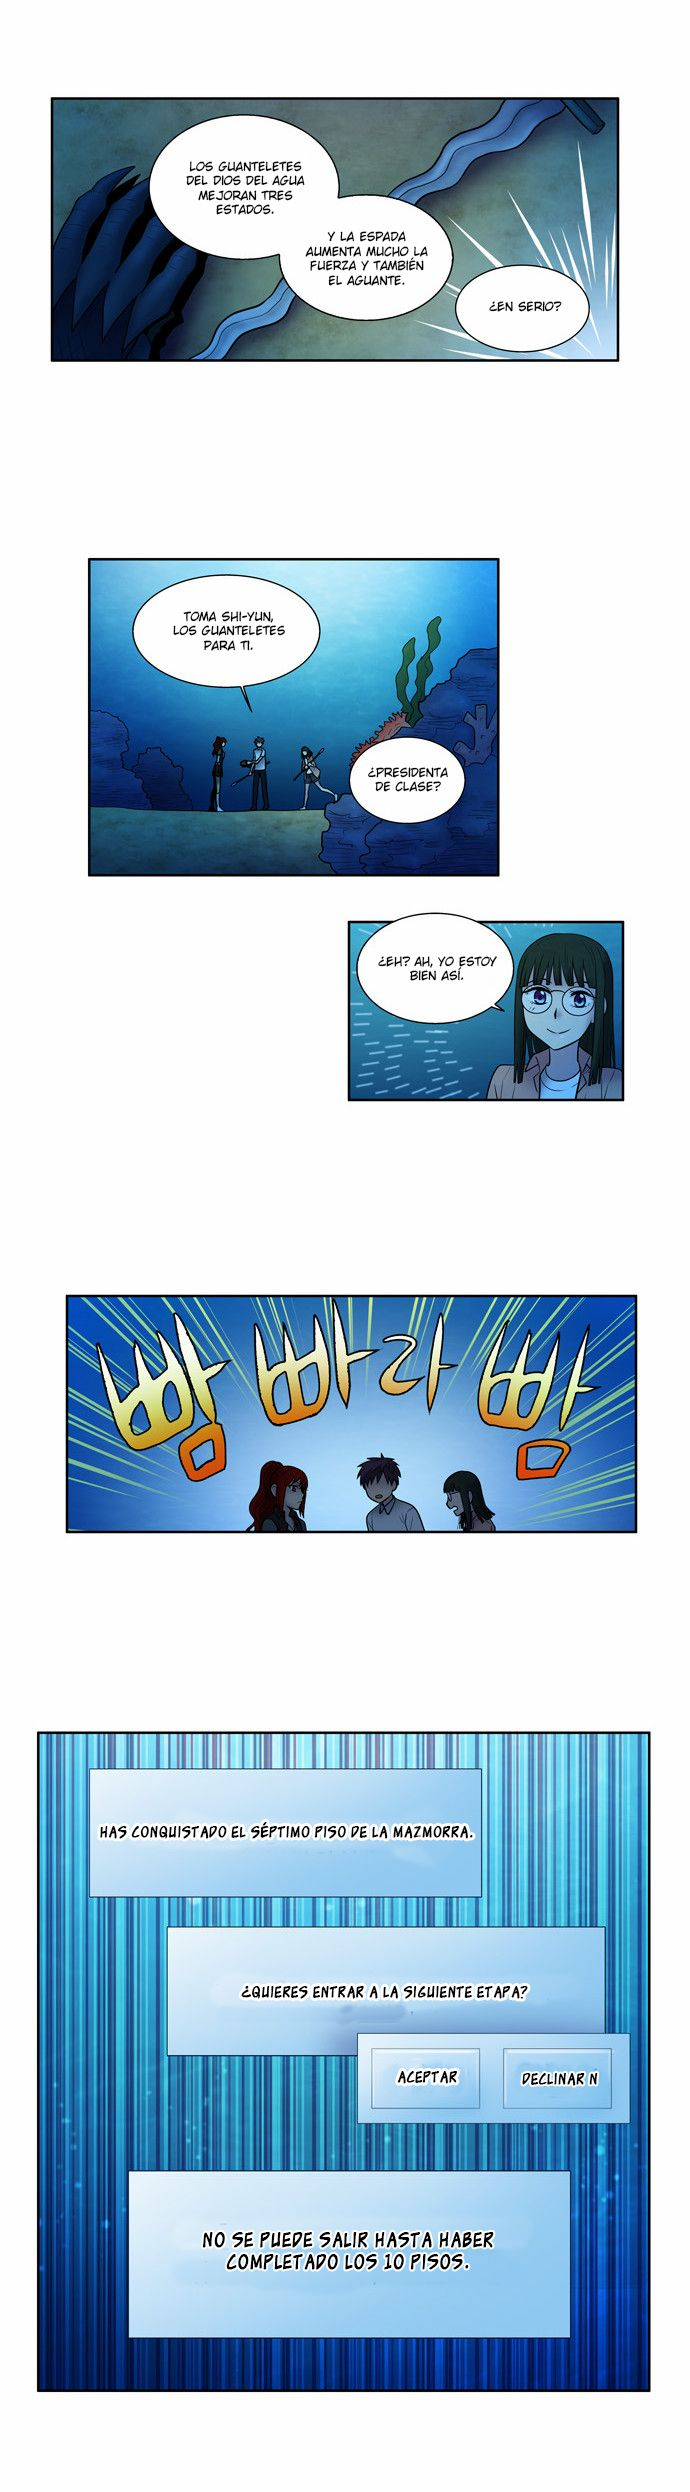 http://c5.ninemanga.com/es_manga/pic2/61/1725/502851/124ef391809a7840a9b2d4454facb867.jpg Page 10